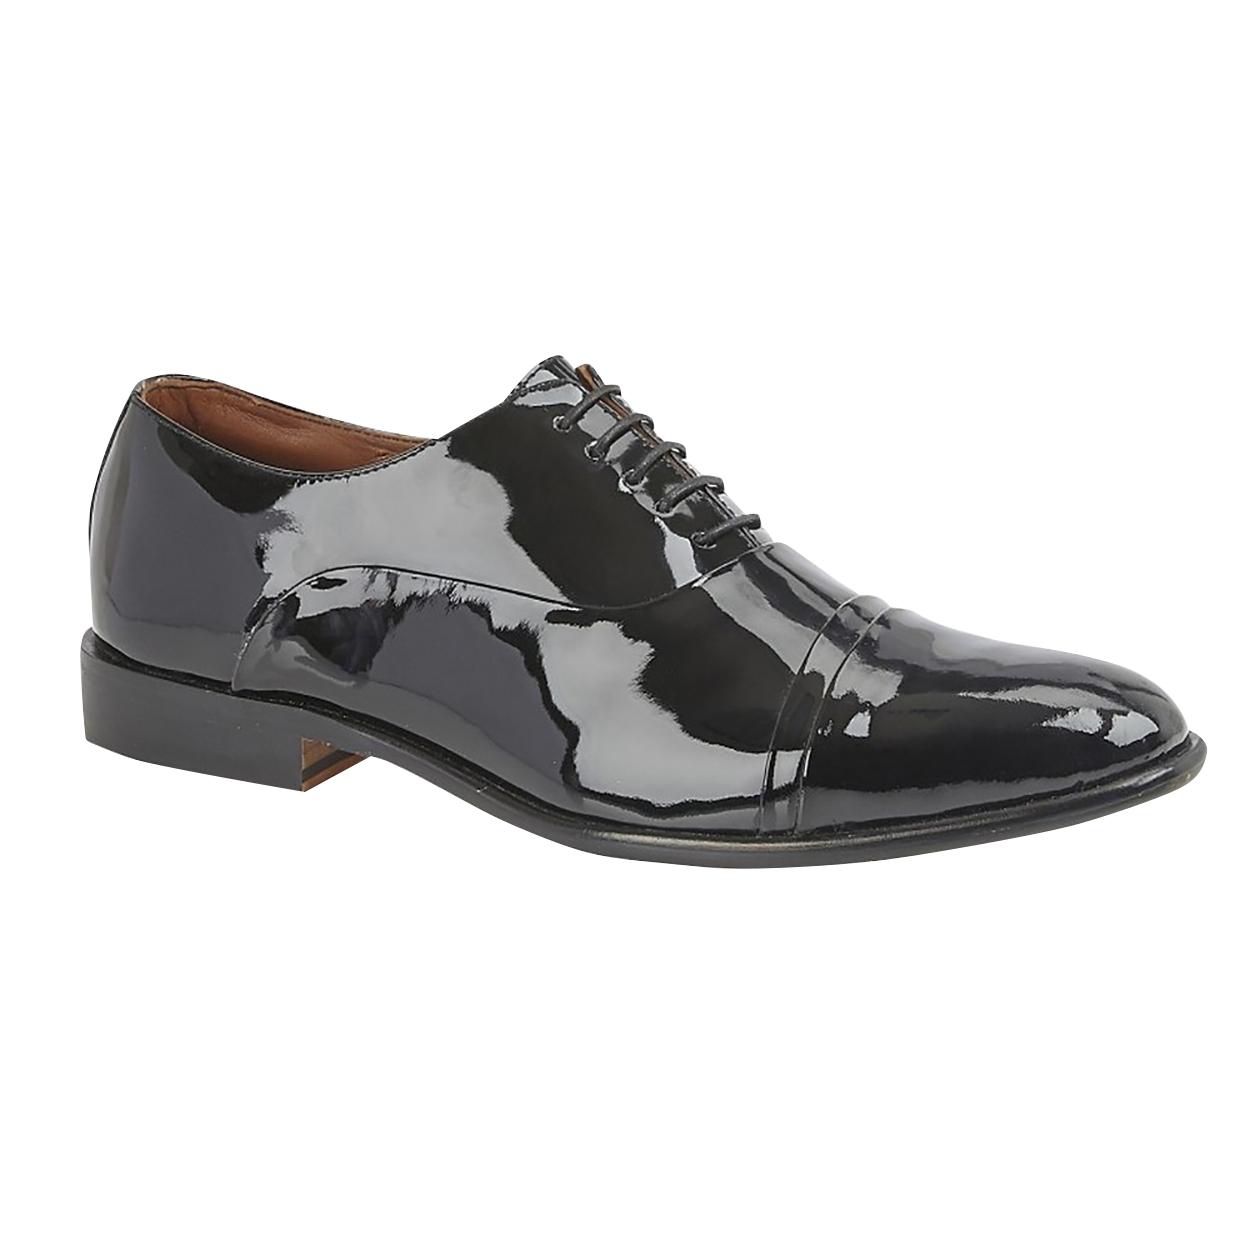 Kensington Classics Mens Capped Oxford Tie Patent Leather Shoes (13 UK) (Black)